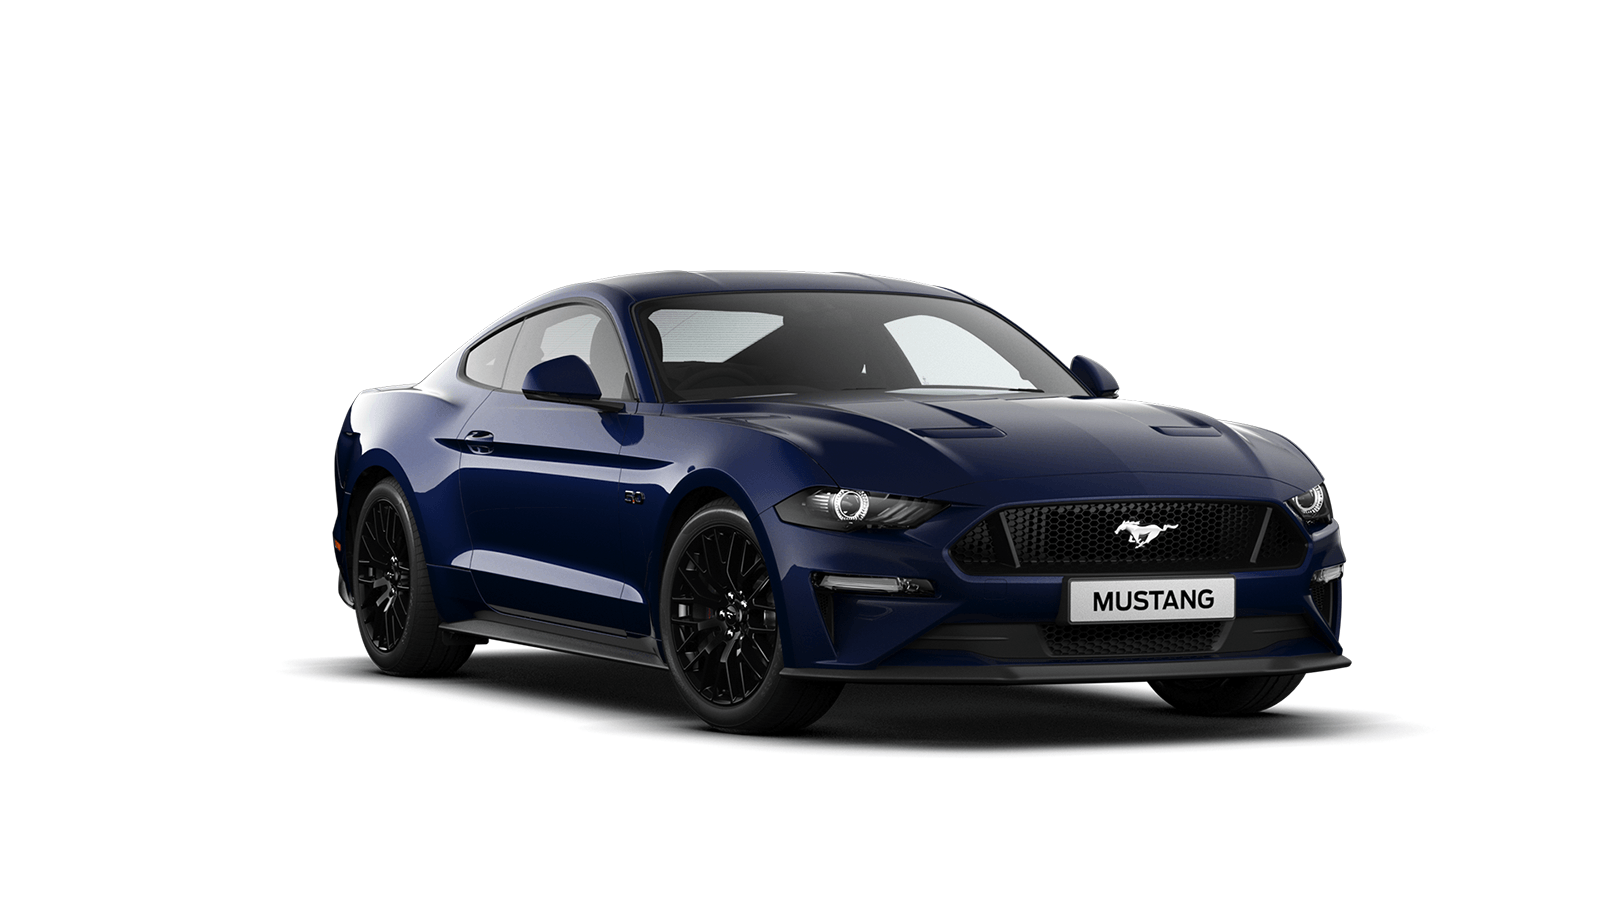 NEW MUSTANG 5.0 V8 GT Fastback in Kona Blue